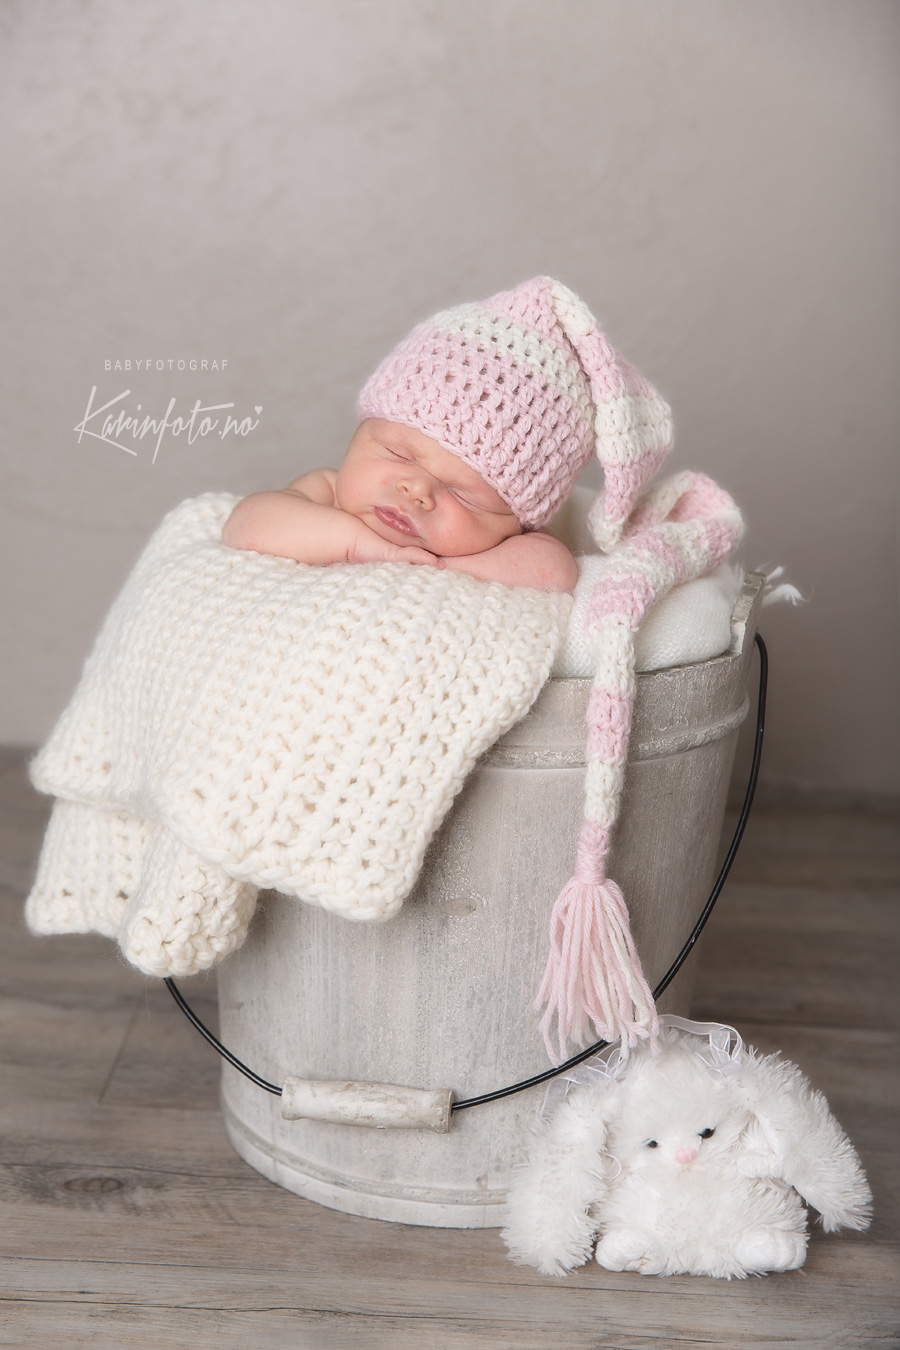 Erfaren nyfødtfotograf i Sarpsborg,nyfødtfotografering,Sovehjerte,lillestrøm,Oslo,babystudio